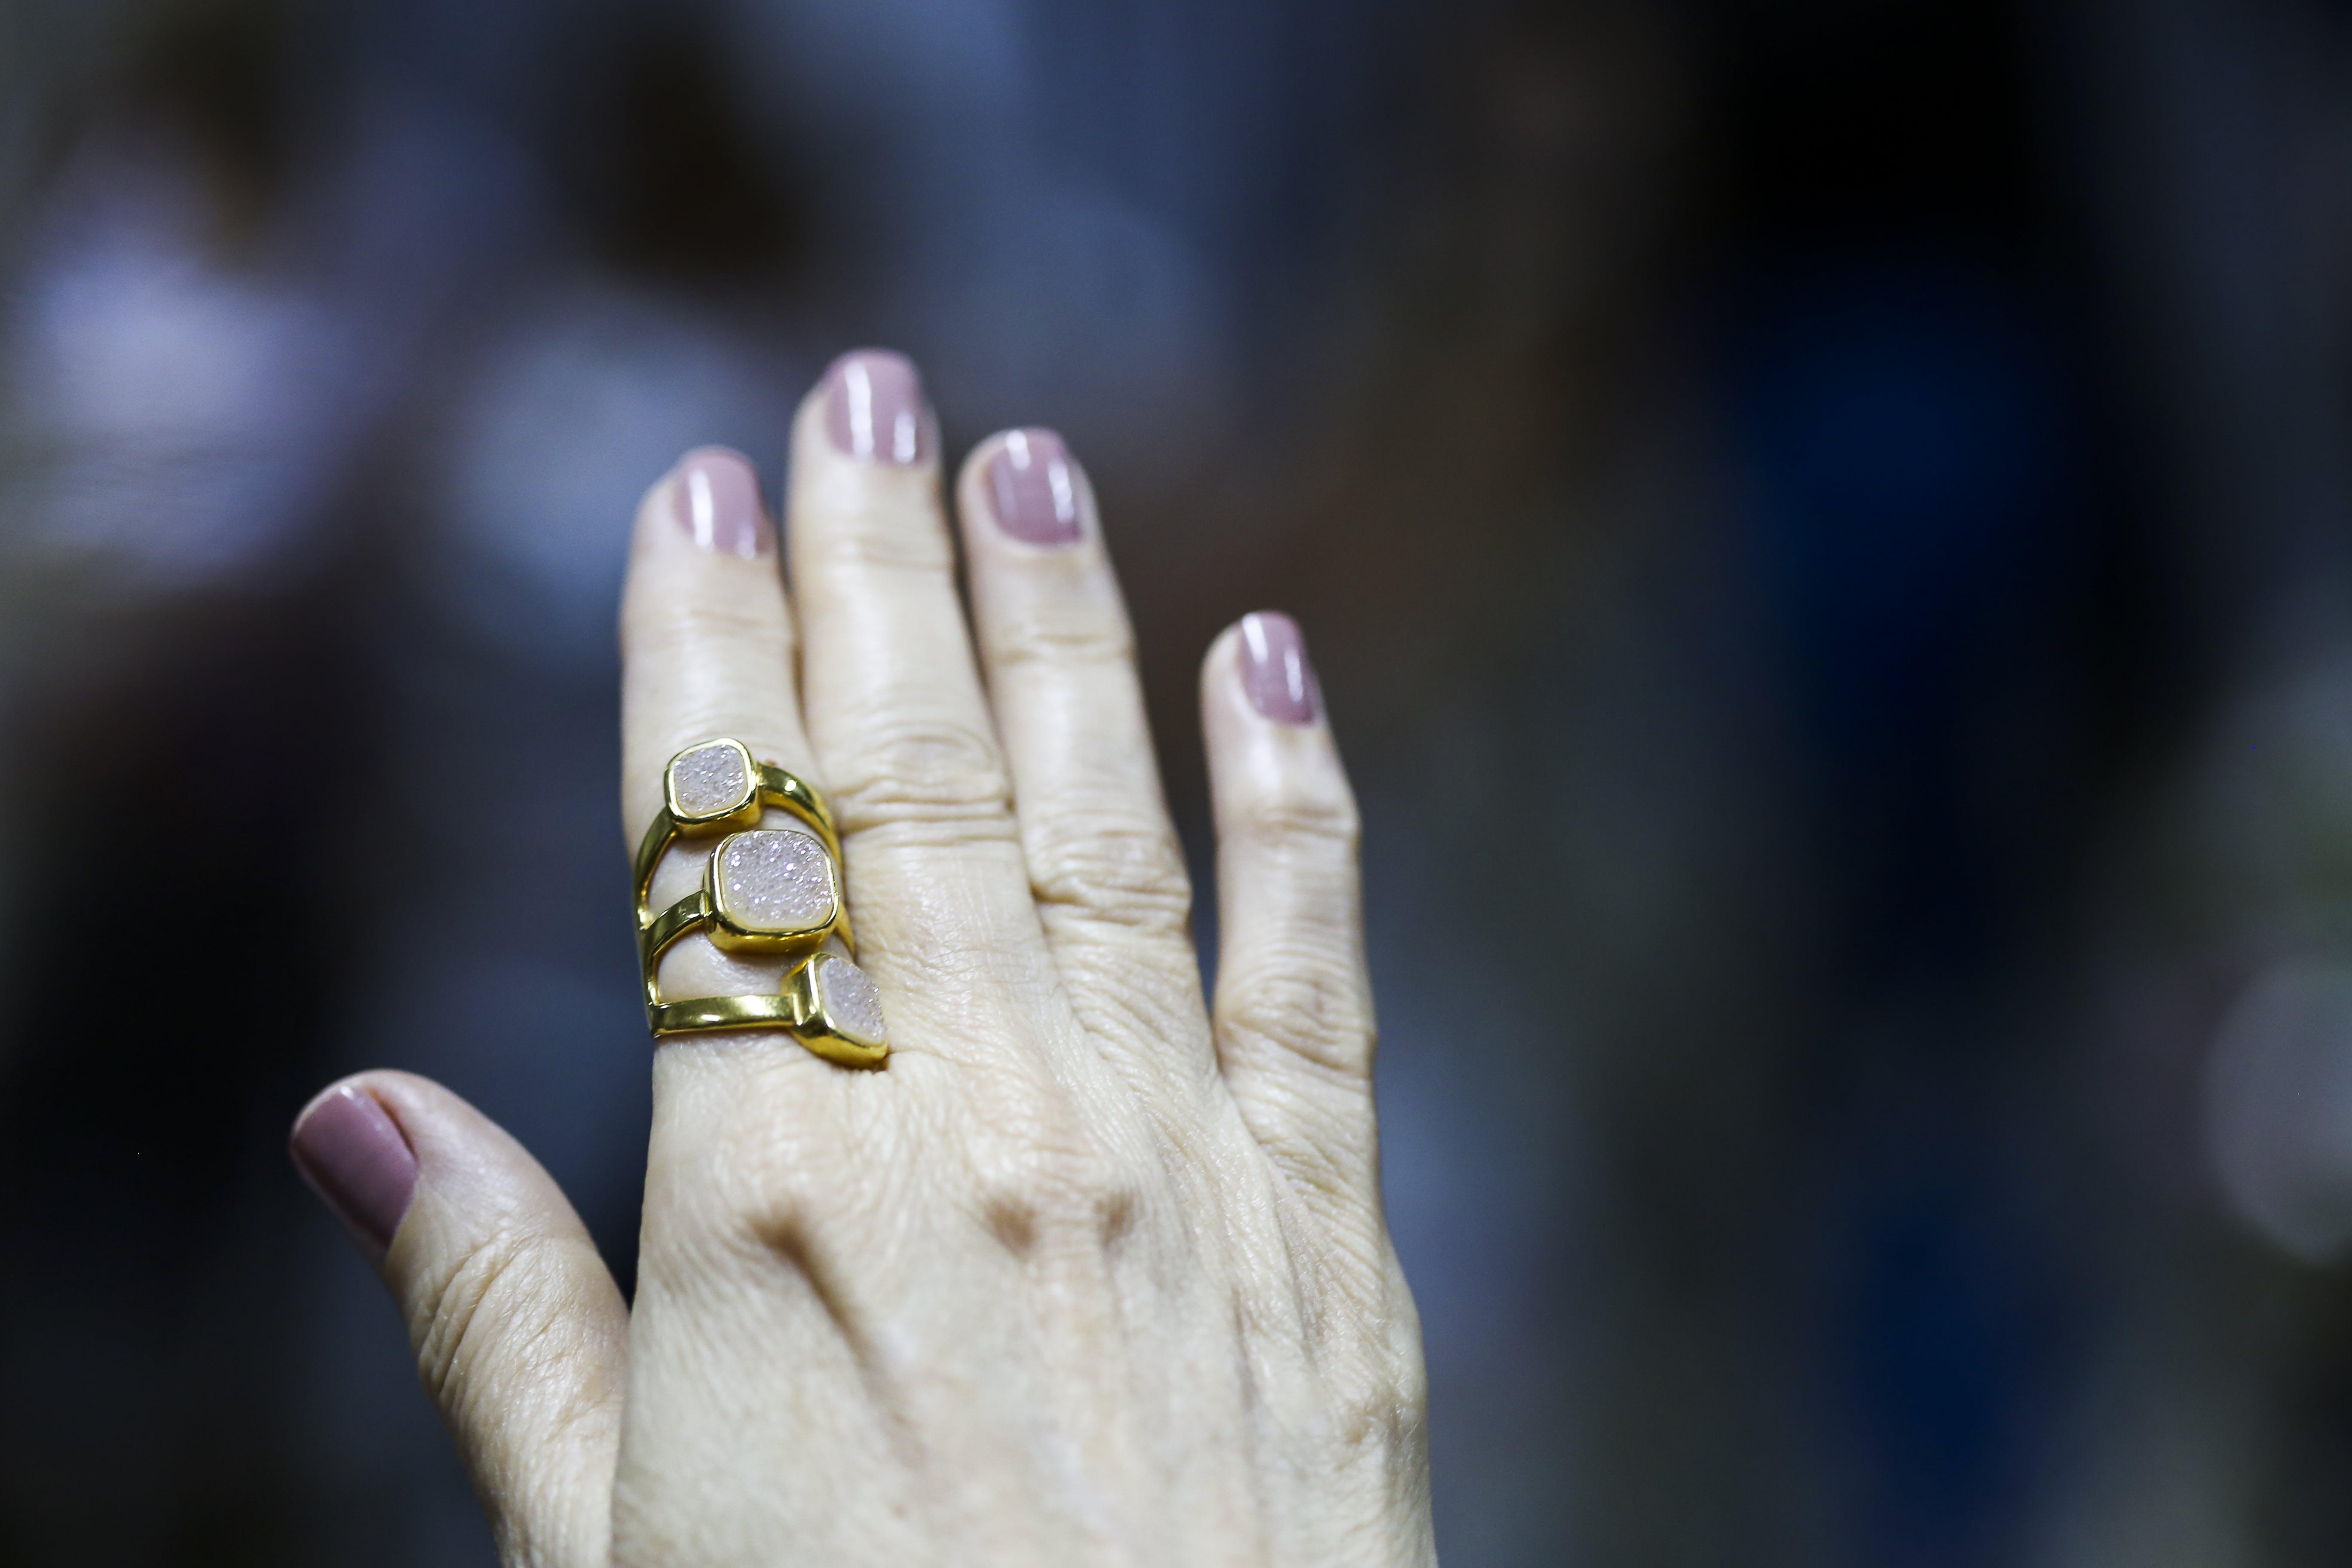 Free stock photo of praise hand